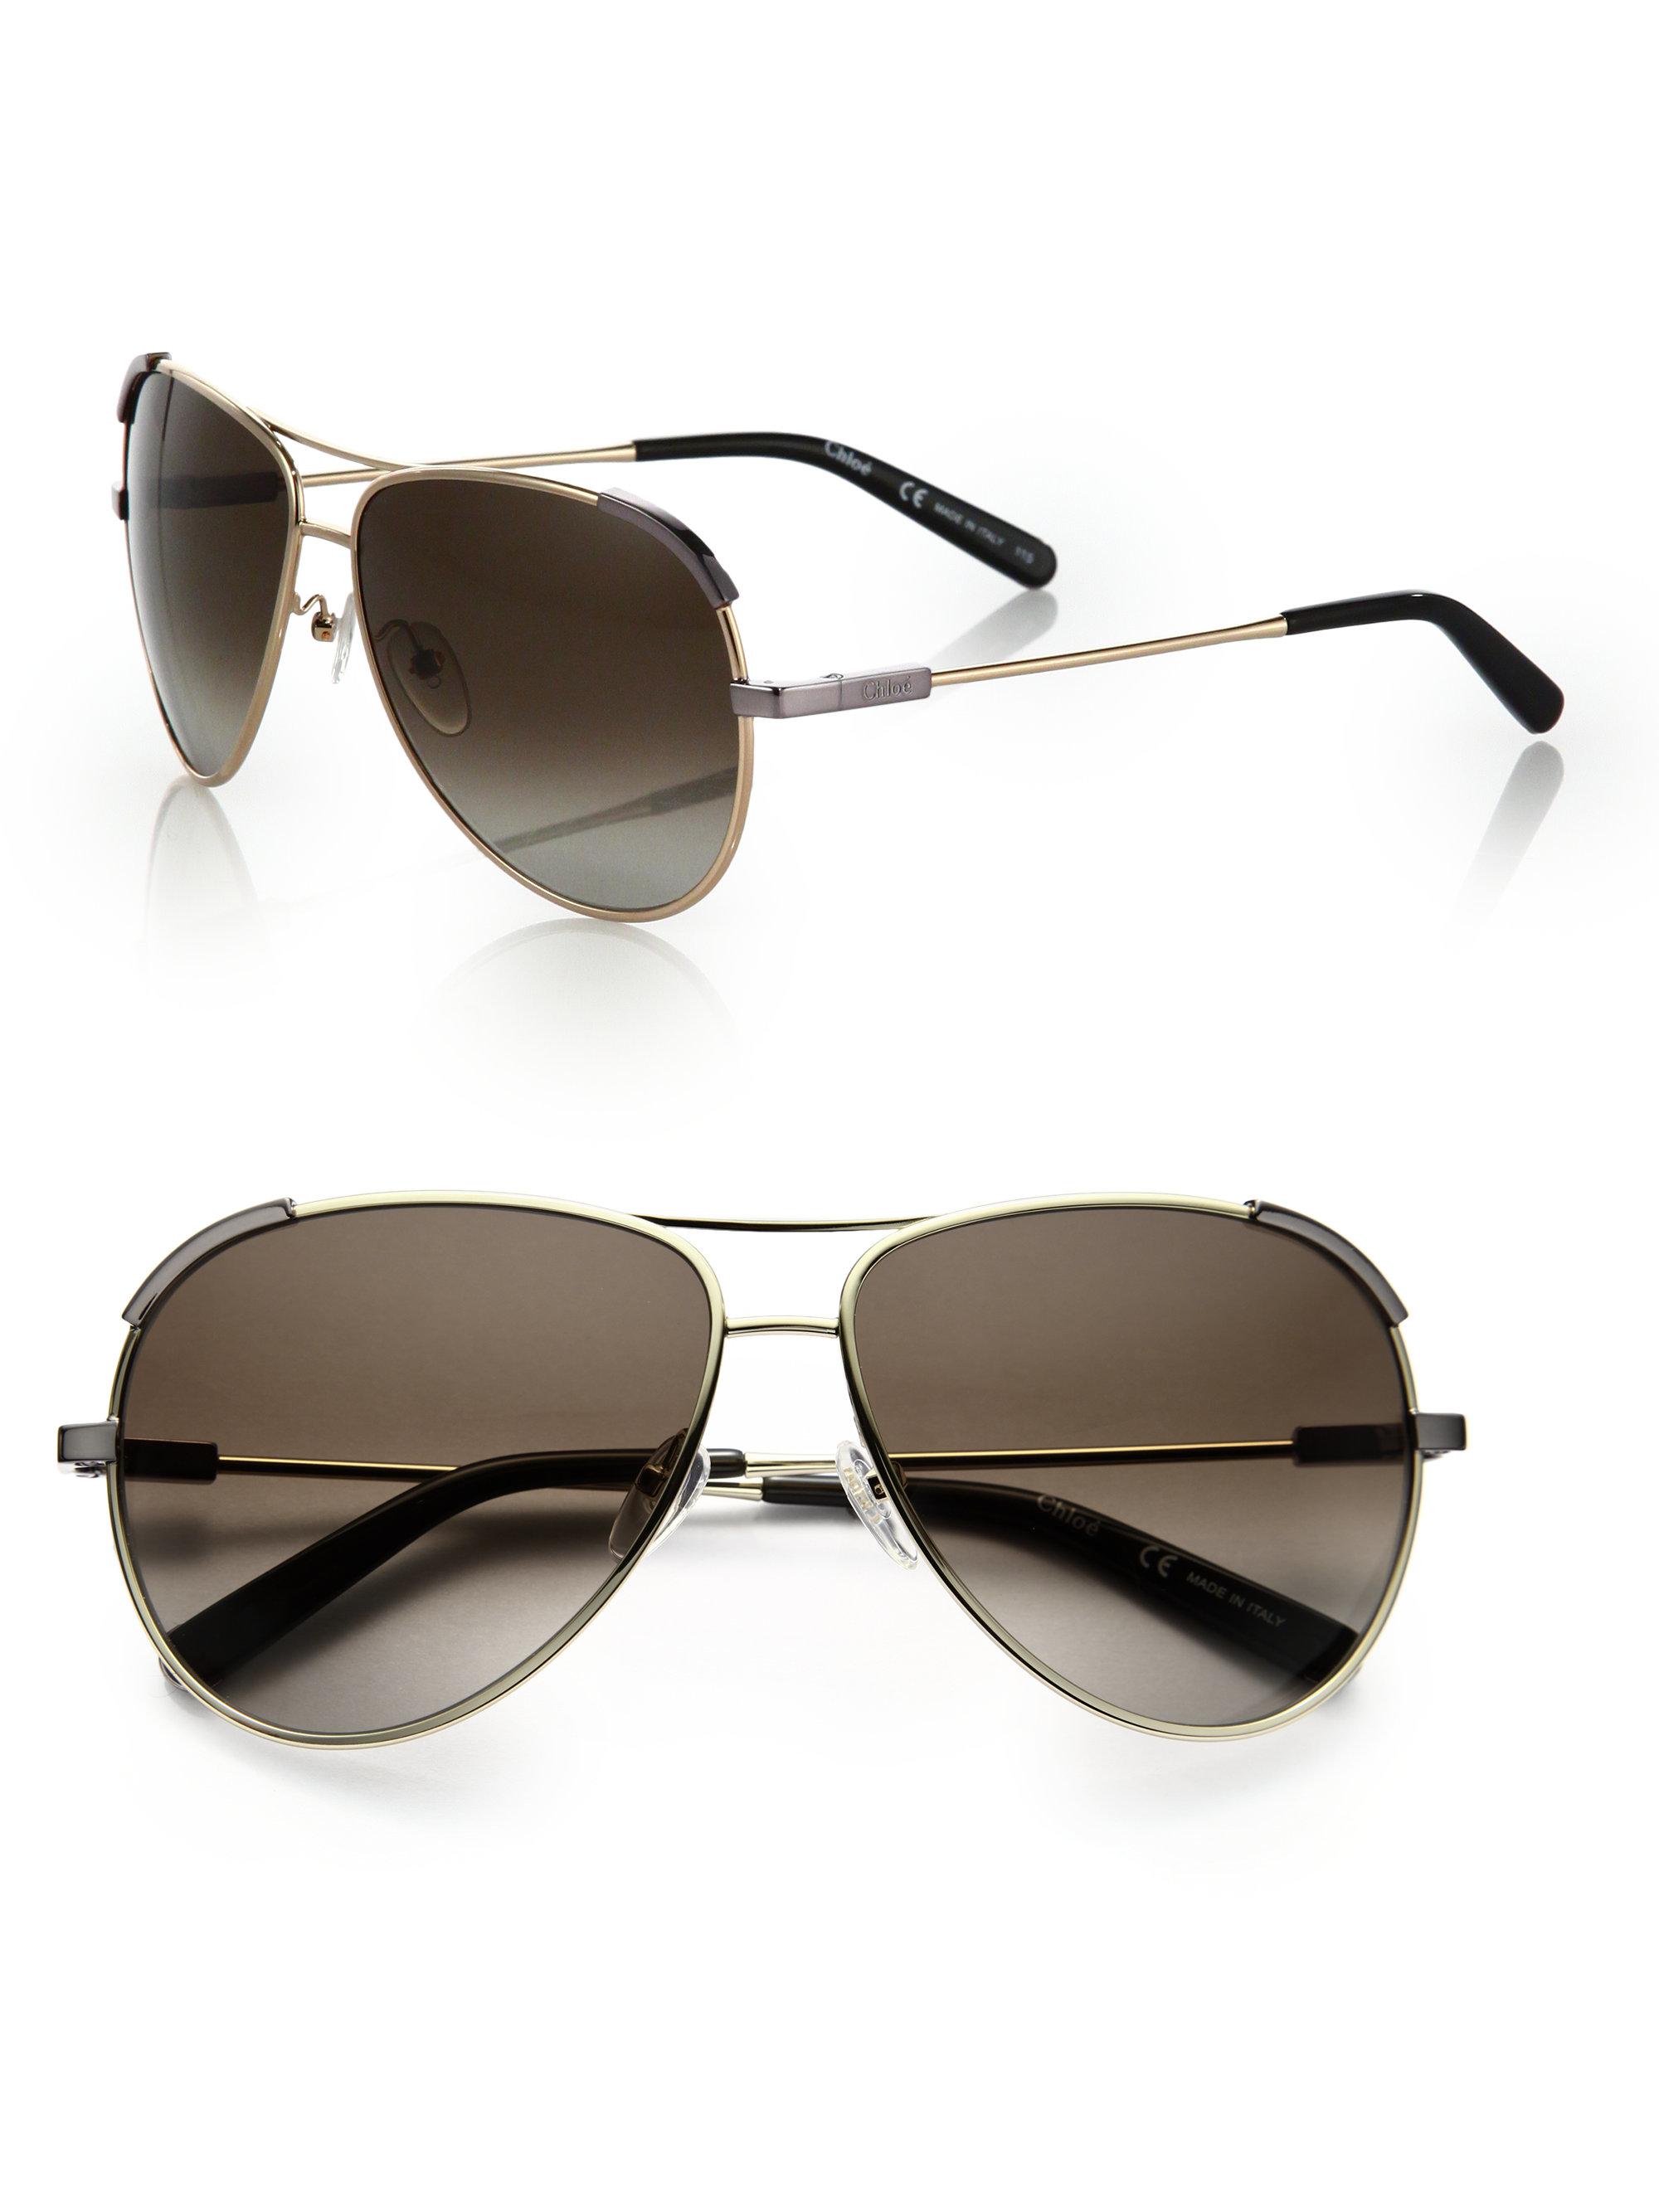 Chloe Gold Frame Sunglasses : Chloe Eric 60mm Aviator Sunglasses in Gold (gold khaki) Lyst